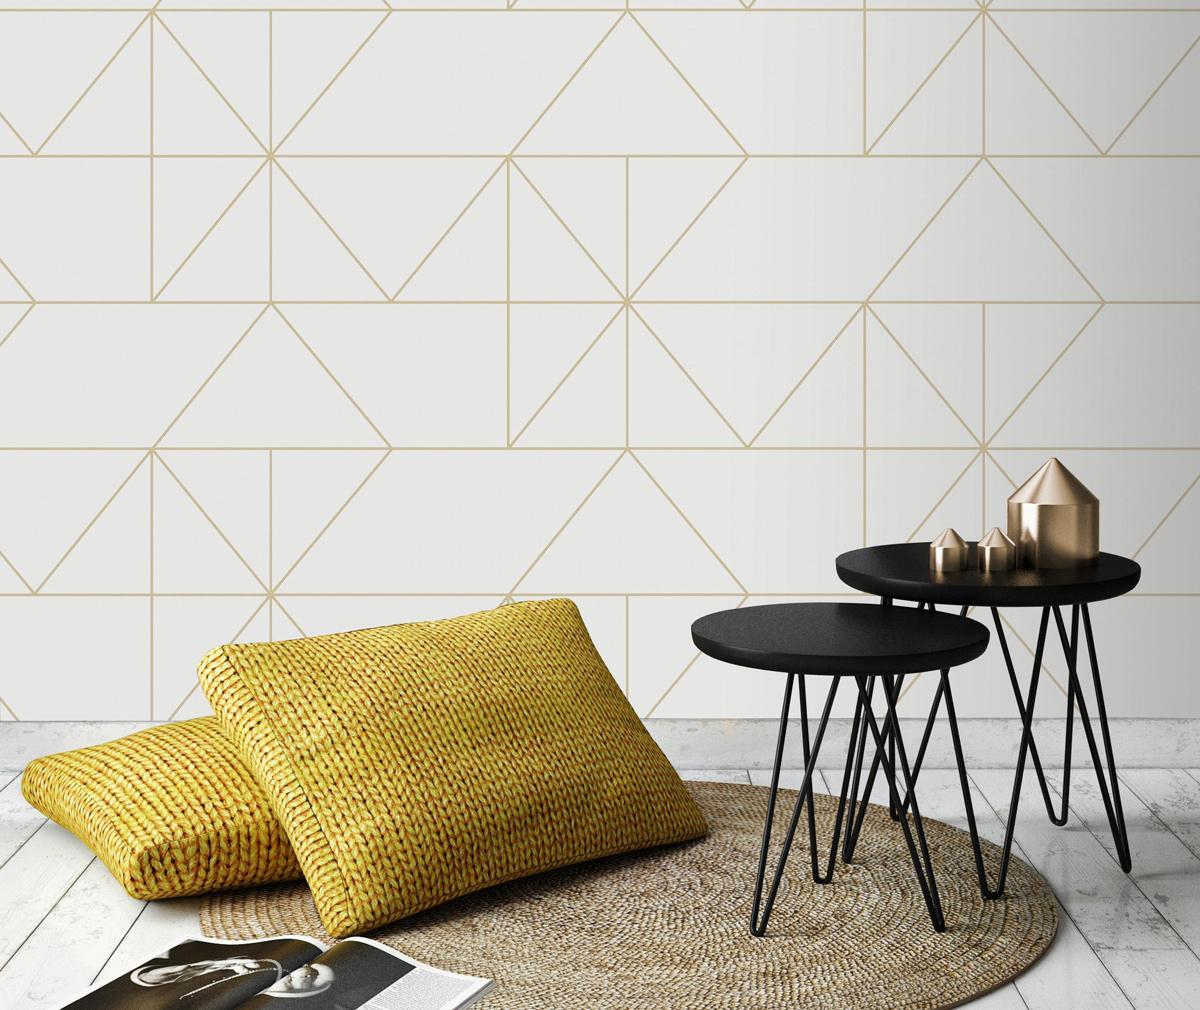 Prachtig lijnenspel op dit vliesbehang geo in de kleur crème en goud. Dit behang is van Graham & Brown (dessin 103003).